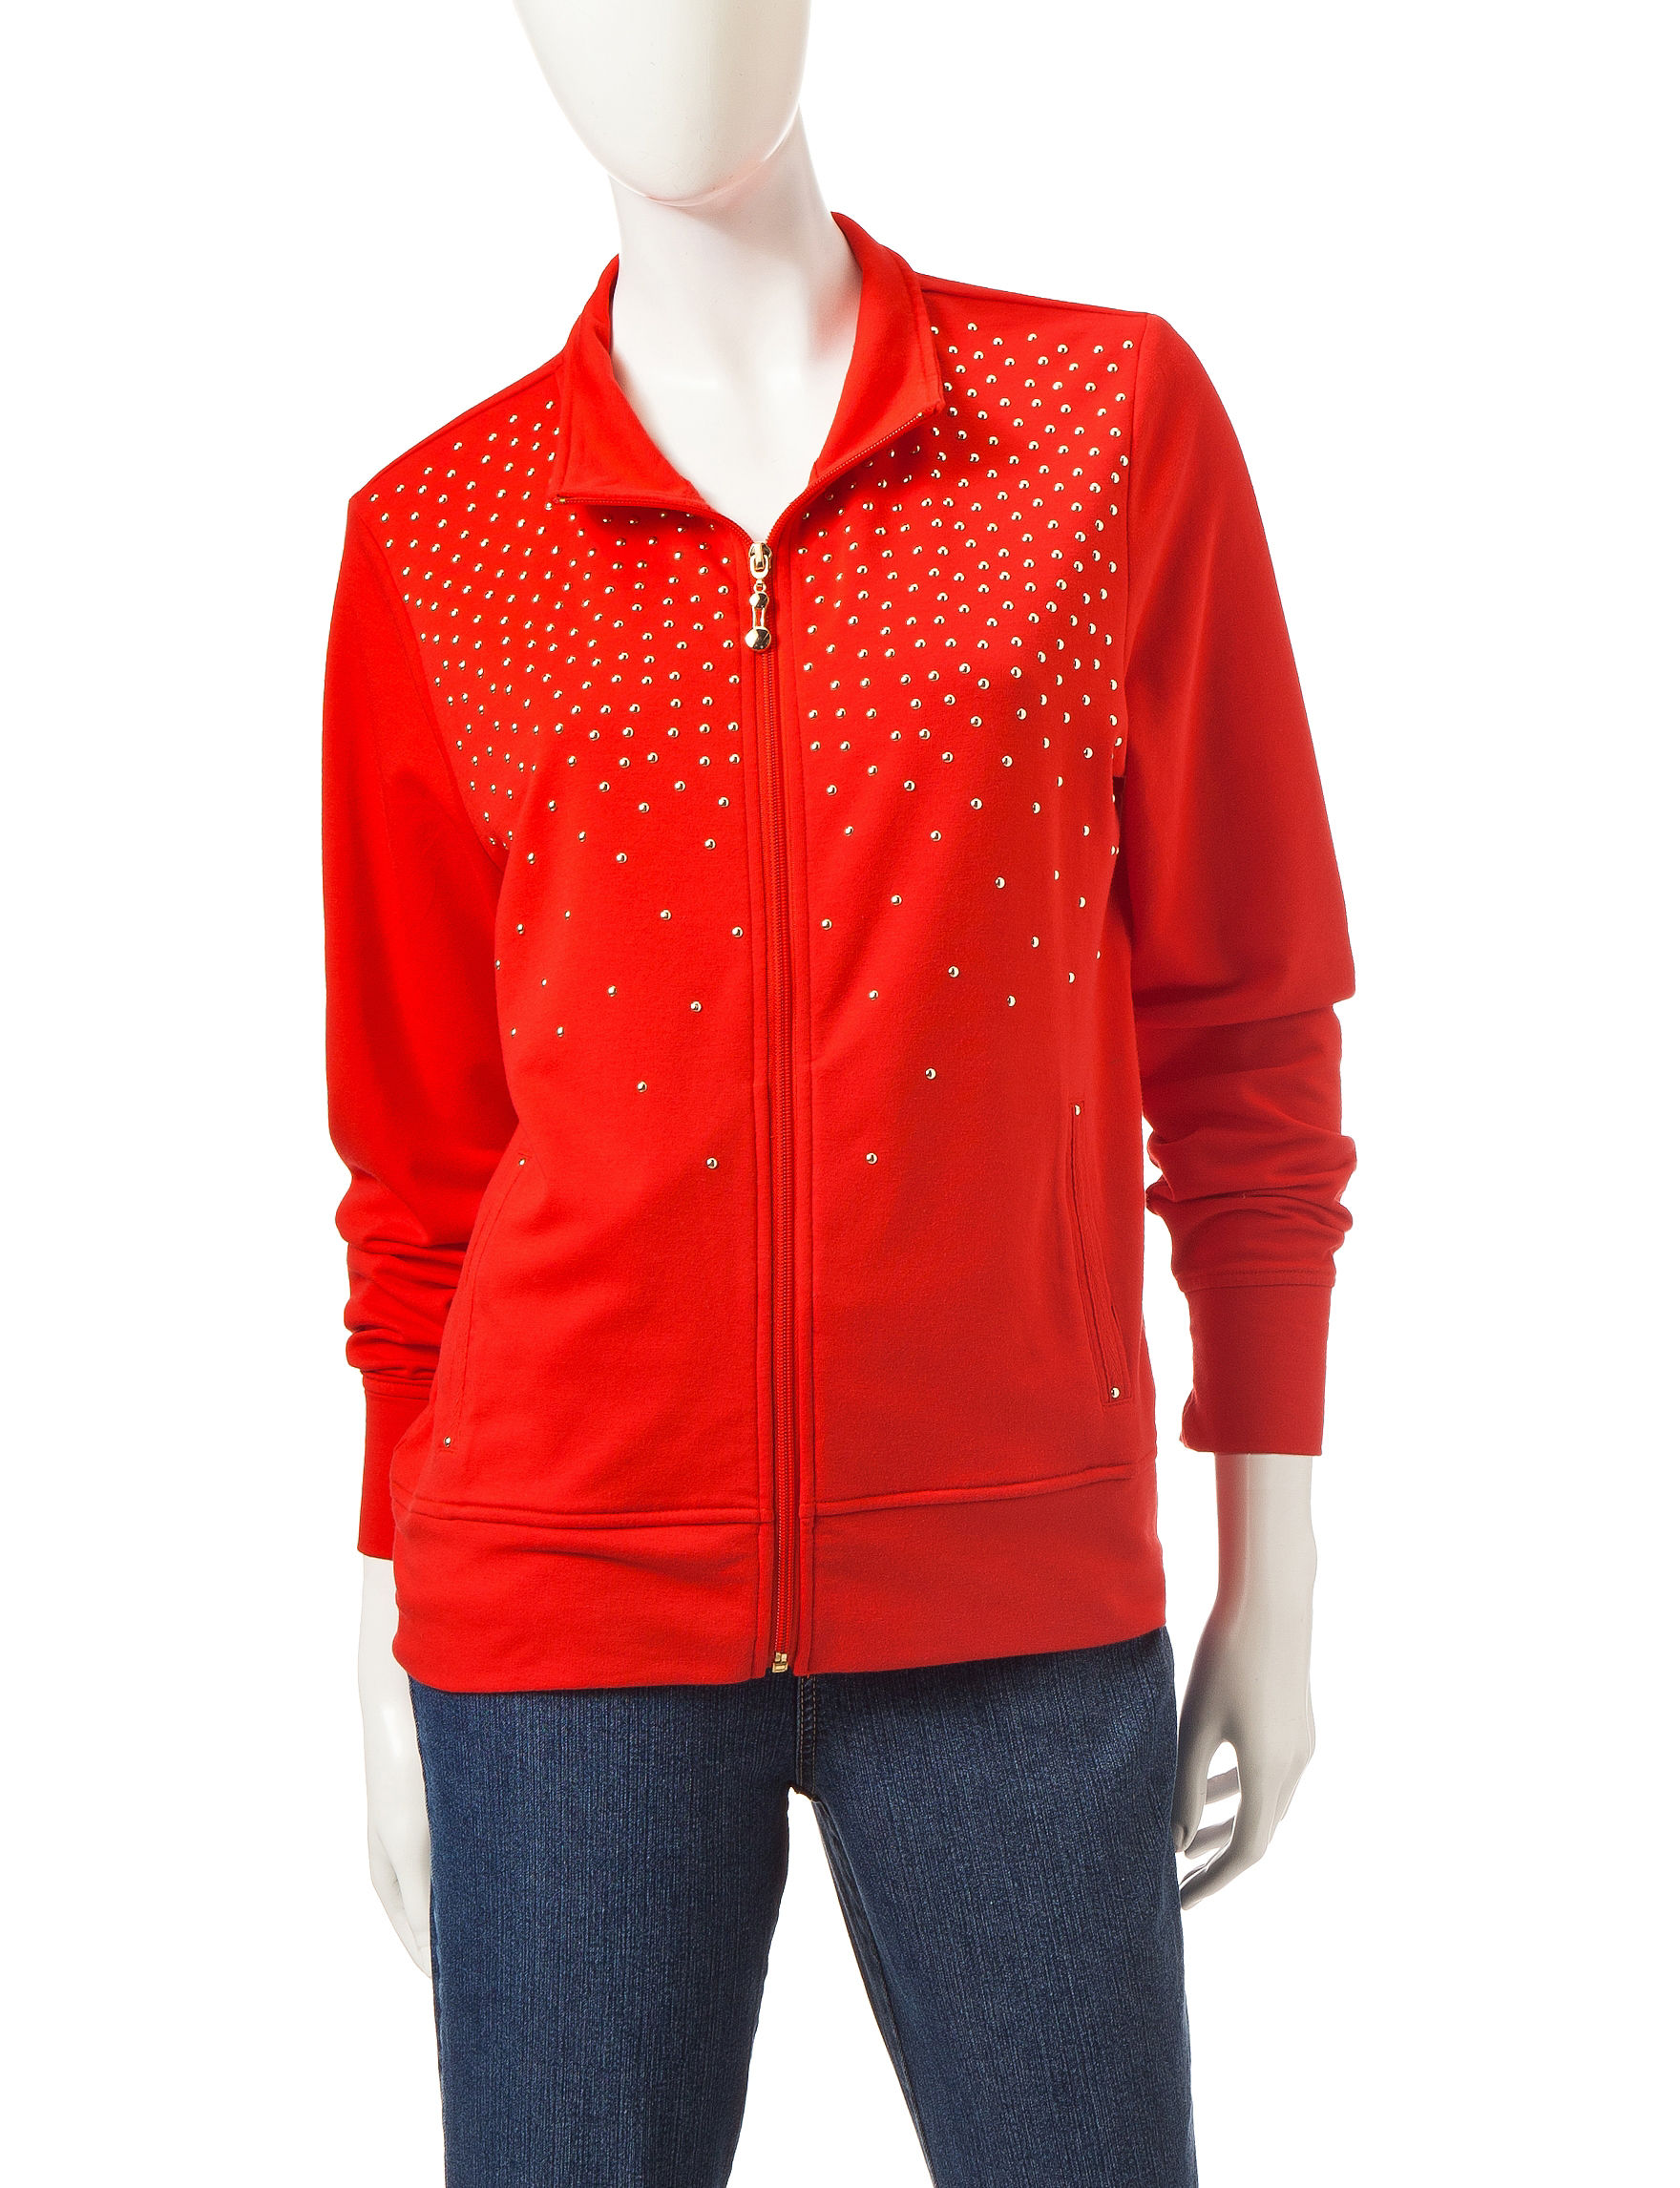 Onque Casuals Red Lightweight Jackets & Blazers